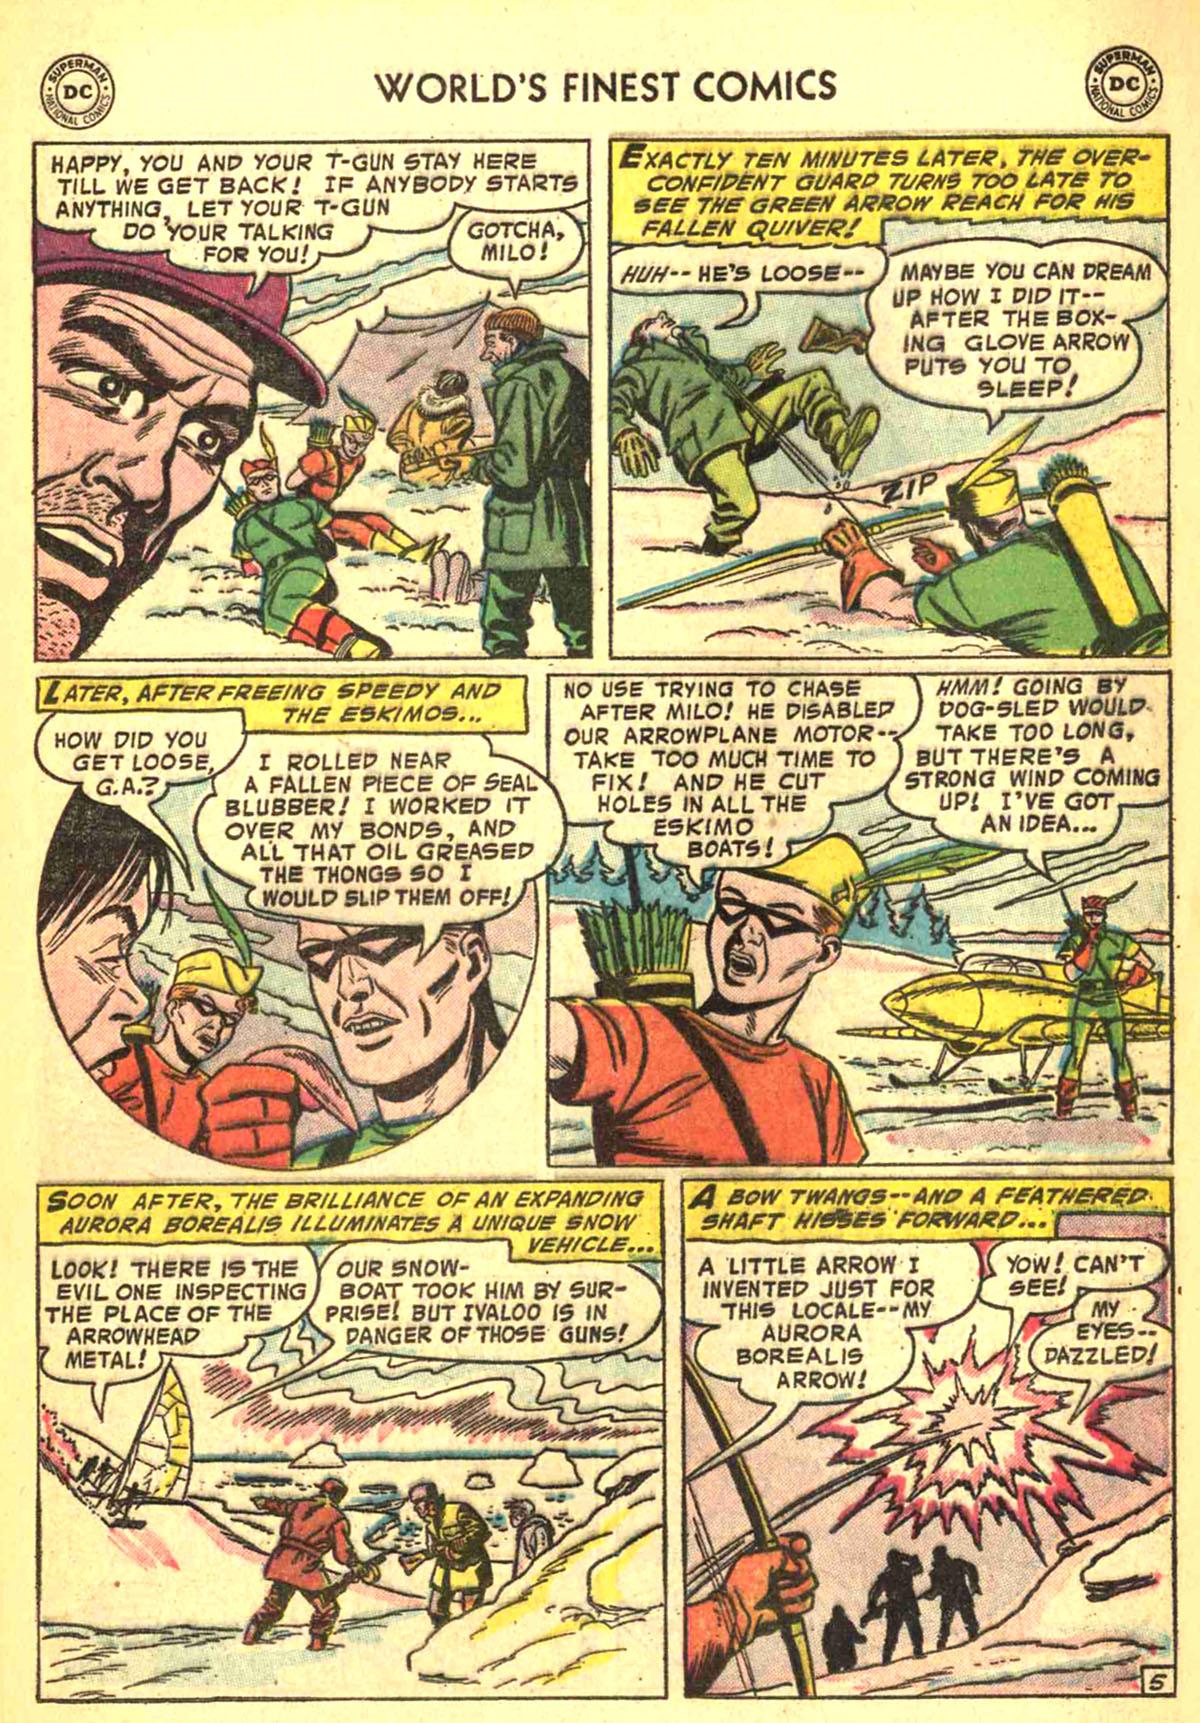 Read online World's Finest Comics comic -  Issue #77 - 21